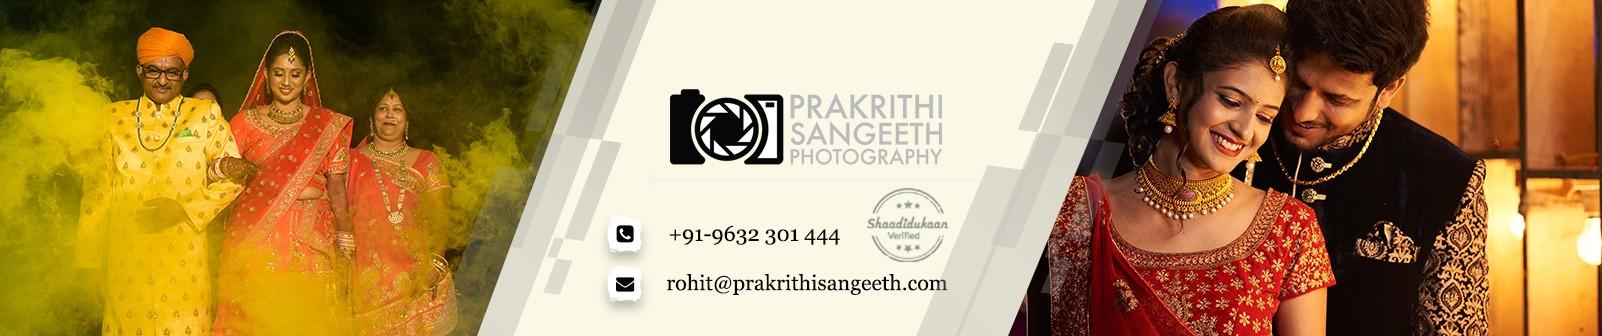 Prakrithi Sangeeth Photography